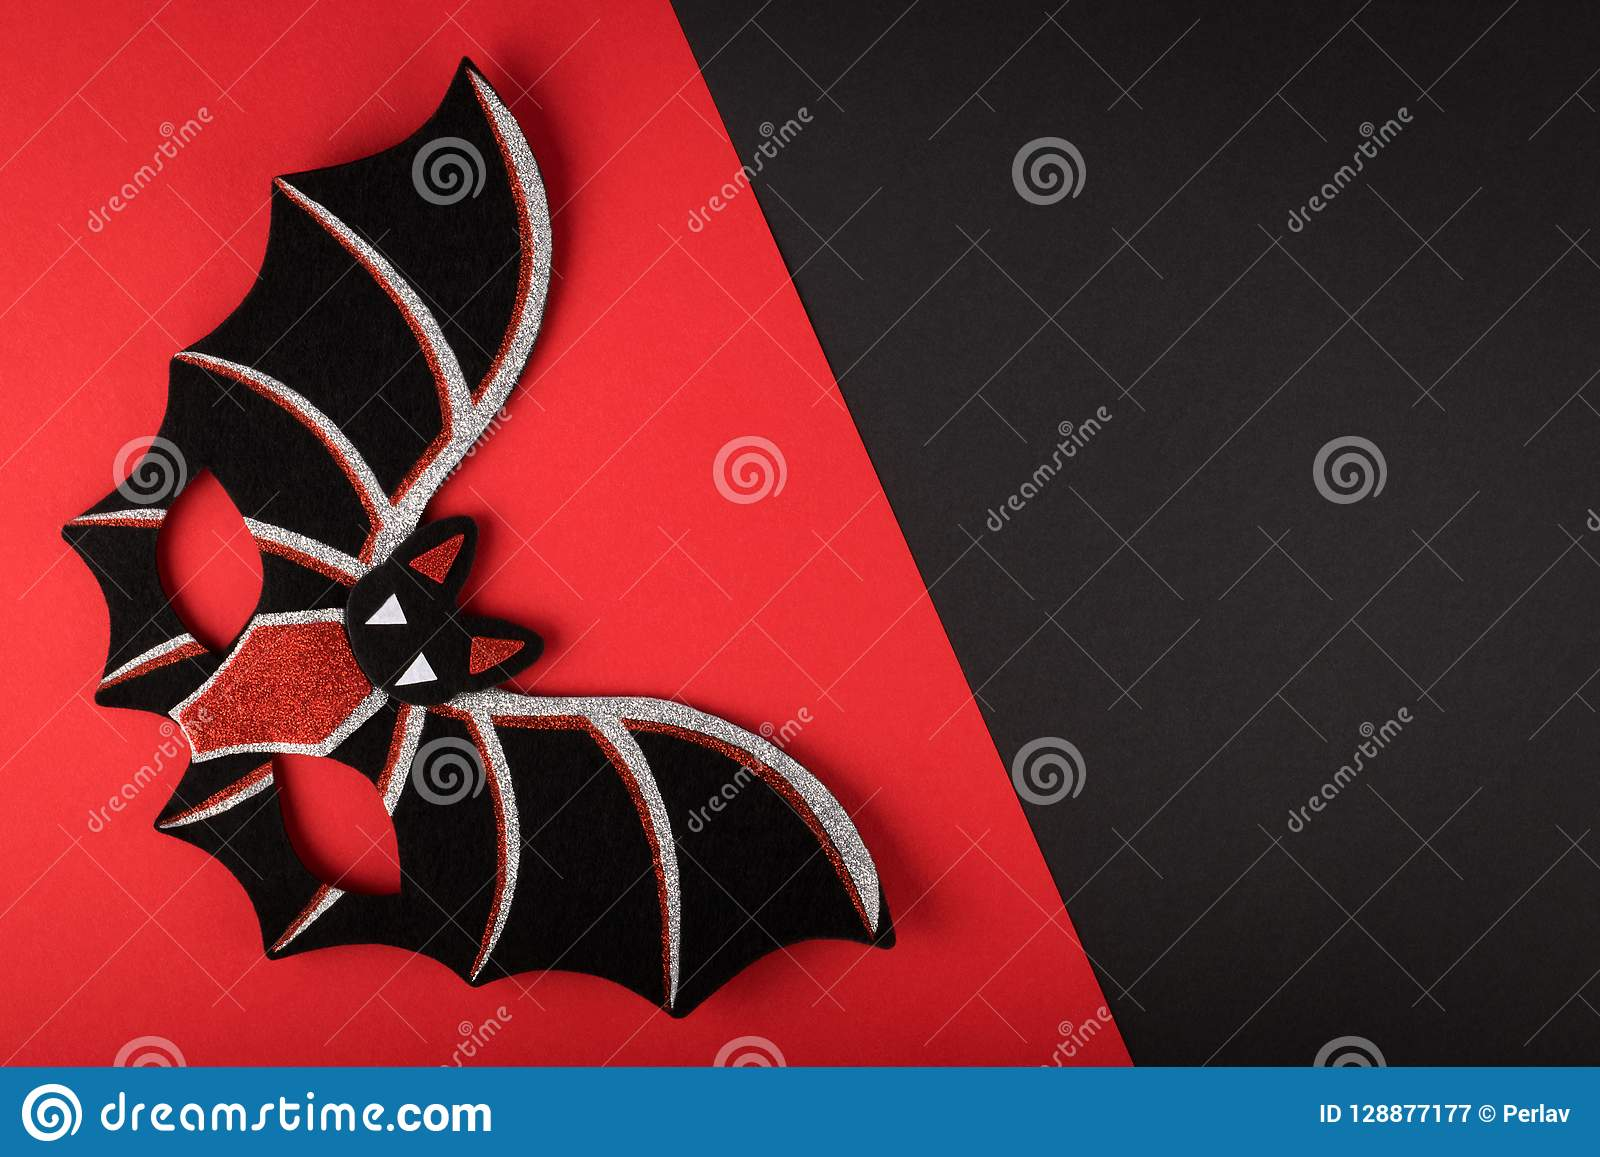 BAT EYE MASK IN RED /& BLACK